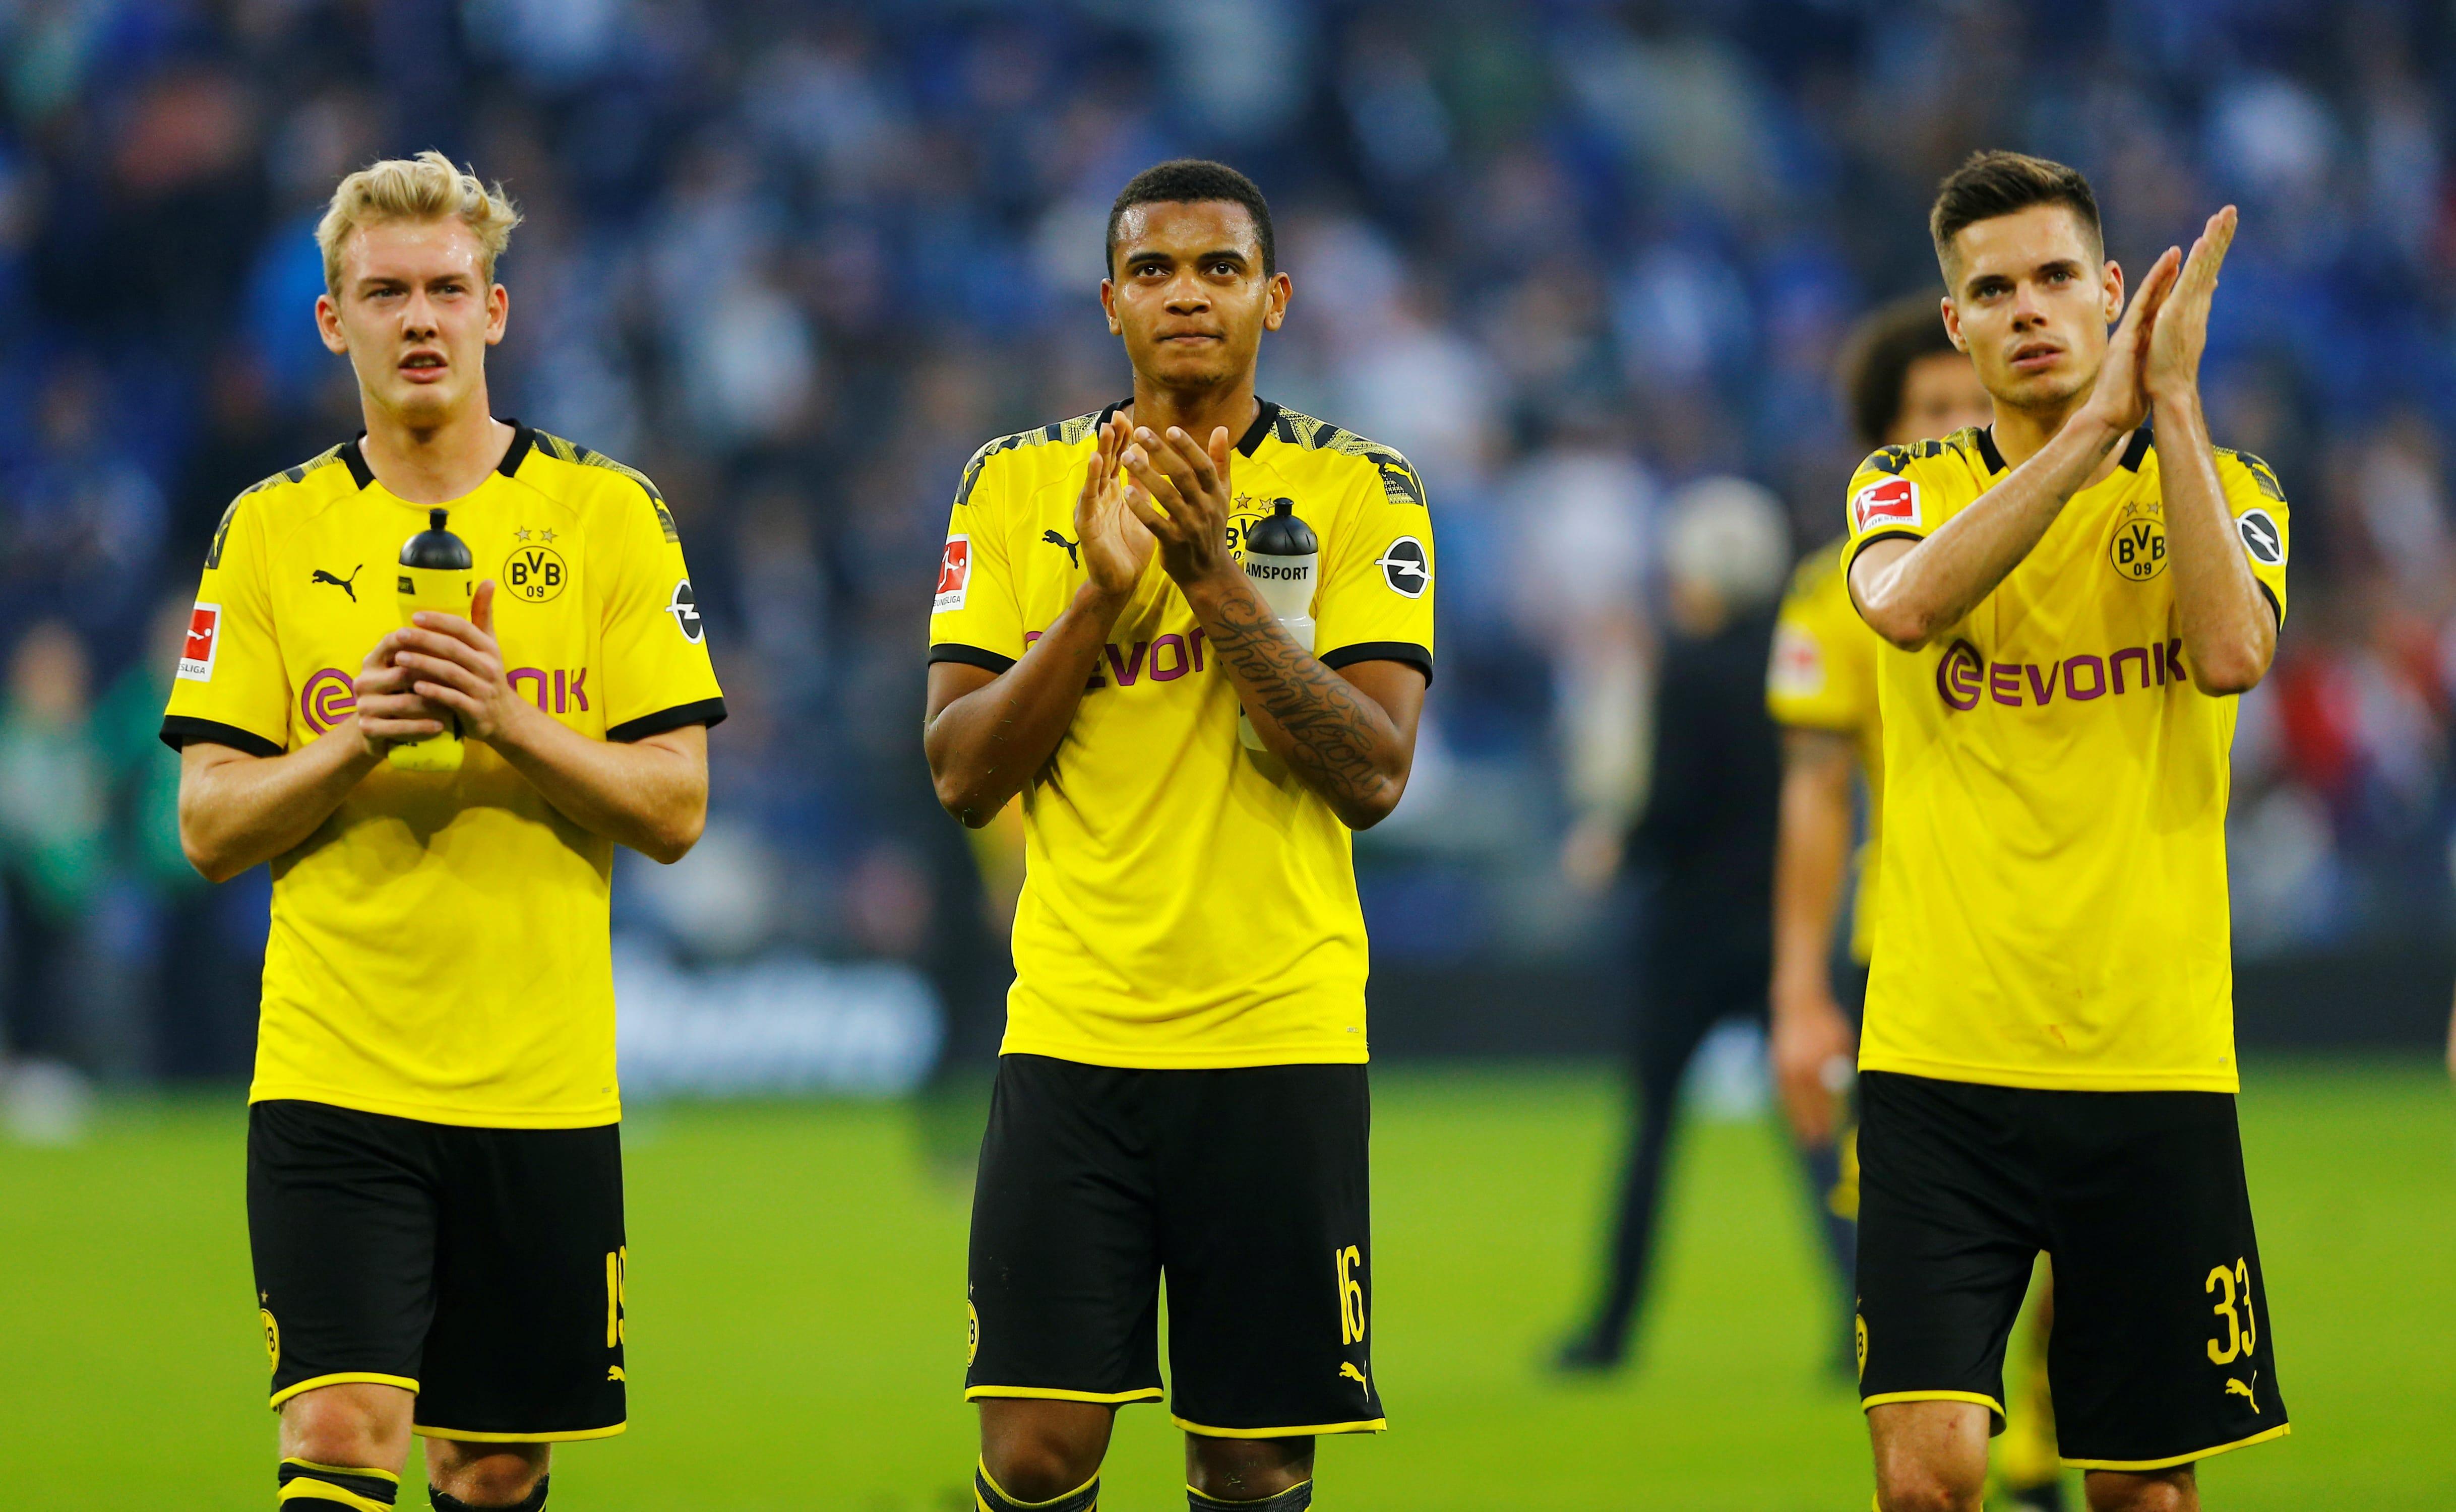 Borussia Dortmund All-Time Goalscorers